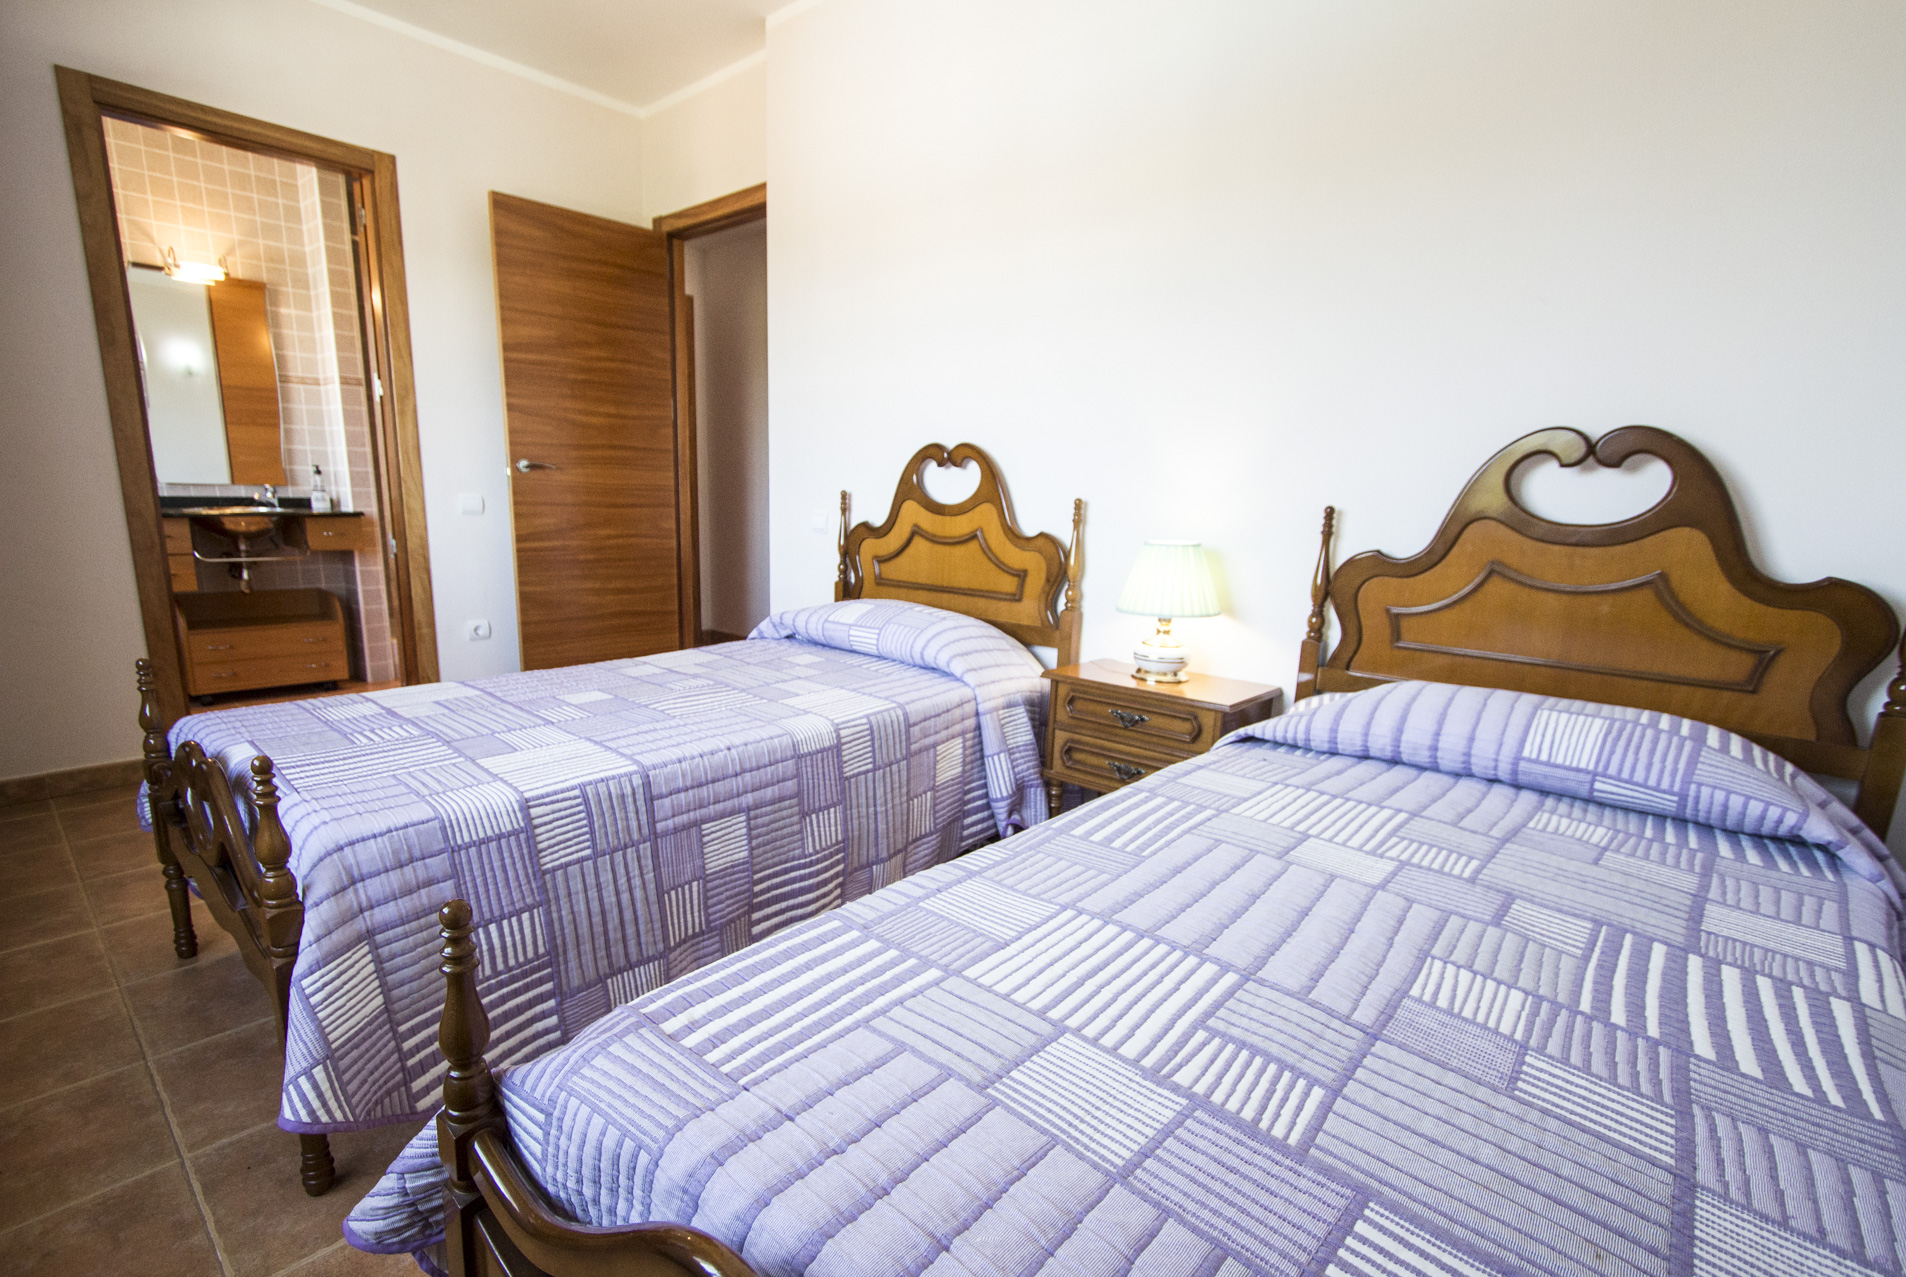 Ferienhaus Catalunya Casas: Incredible Villa in Sils, a short drive to Costa Brava beaches! (1890893), Les Mallorquines, Girona, Katalonien, Spanien, Bild 18